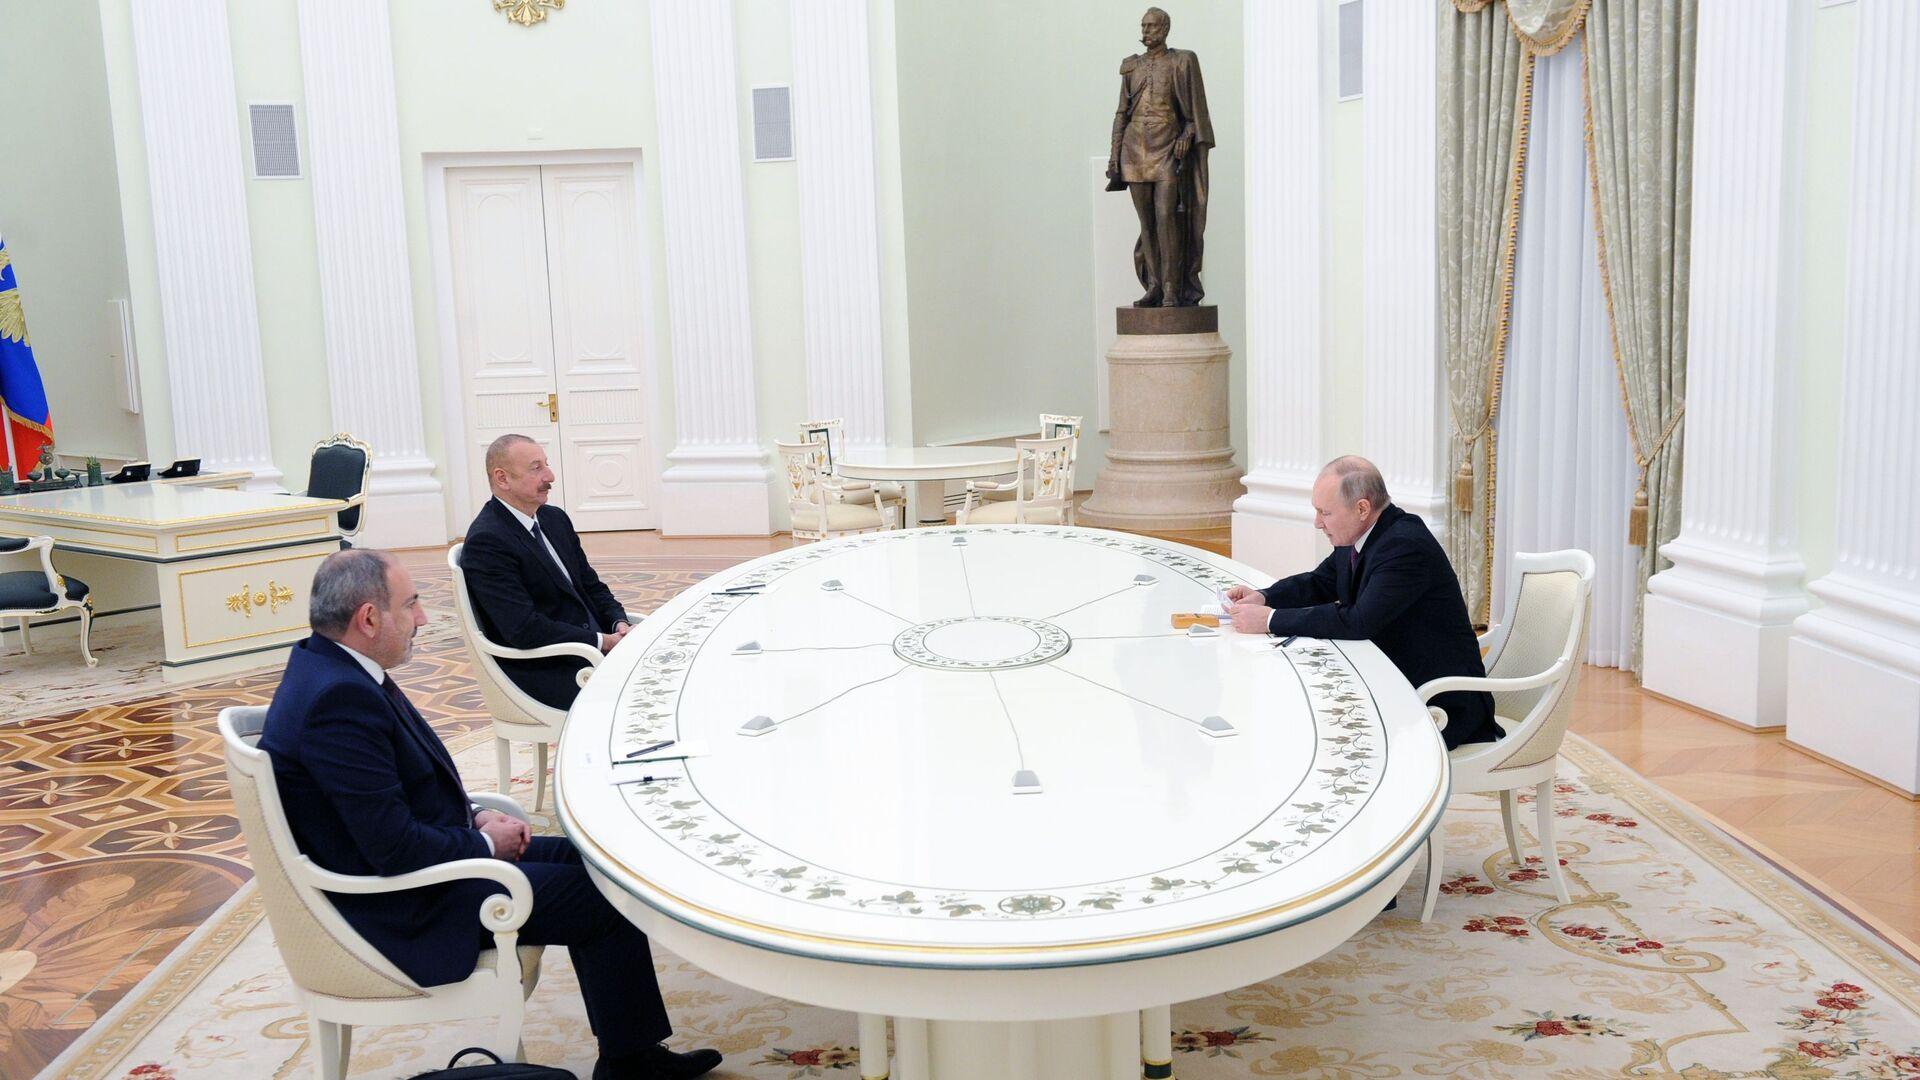 Prezident RF Vladimir Putin, lídr Ázerbájdžánu Ilham Alijev a premiér Arménie Nikol Pašinjan - Sputnik Česká republika, 1920, 11.01.2021